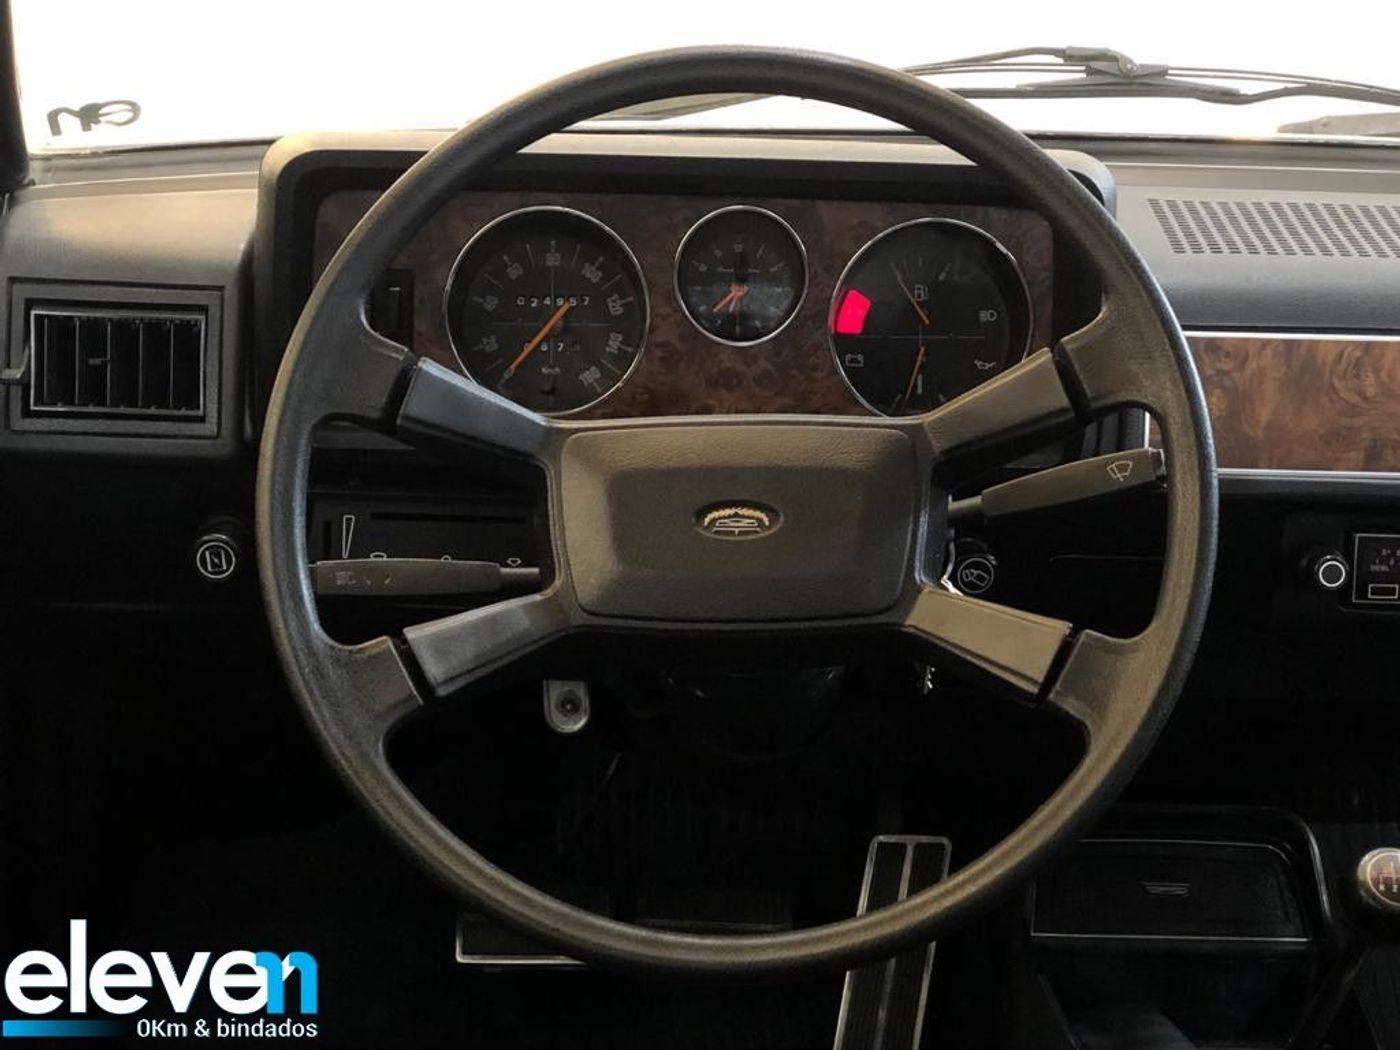 Ford LDO 1.6